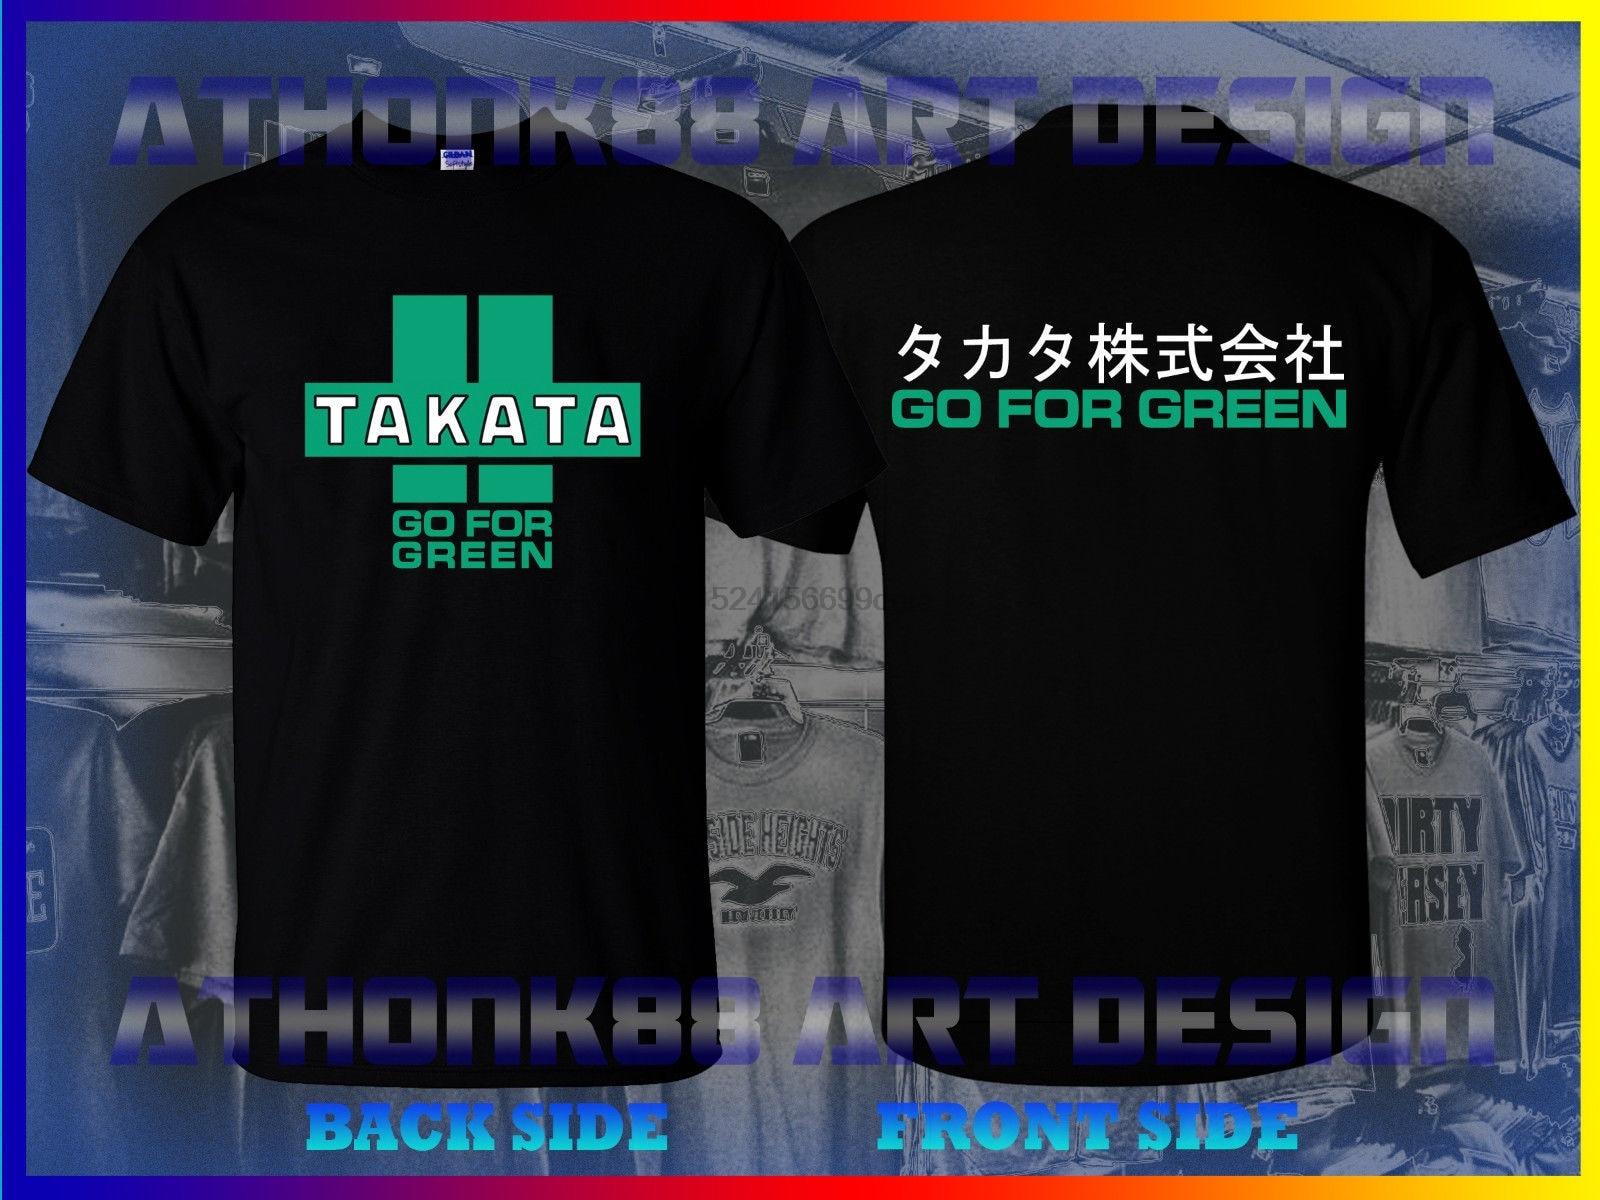 New Takata Racer Scion Fr S T Shirt Takata Go For Green Mens T Shirt